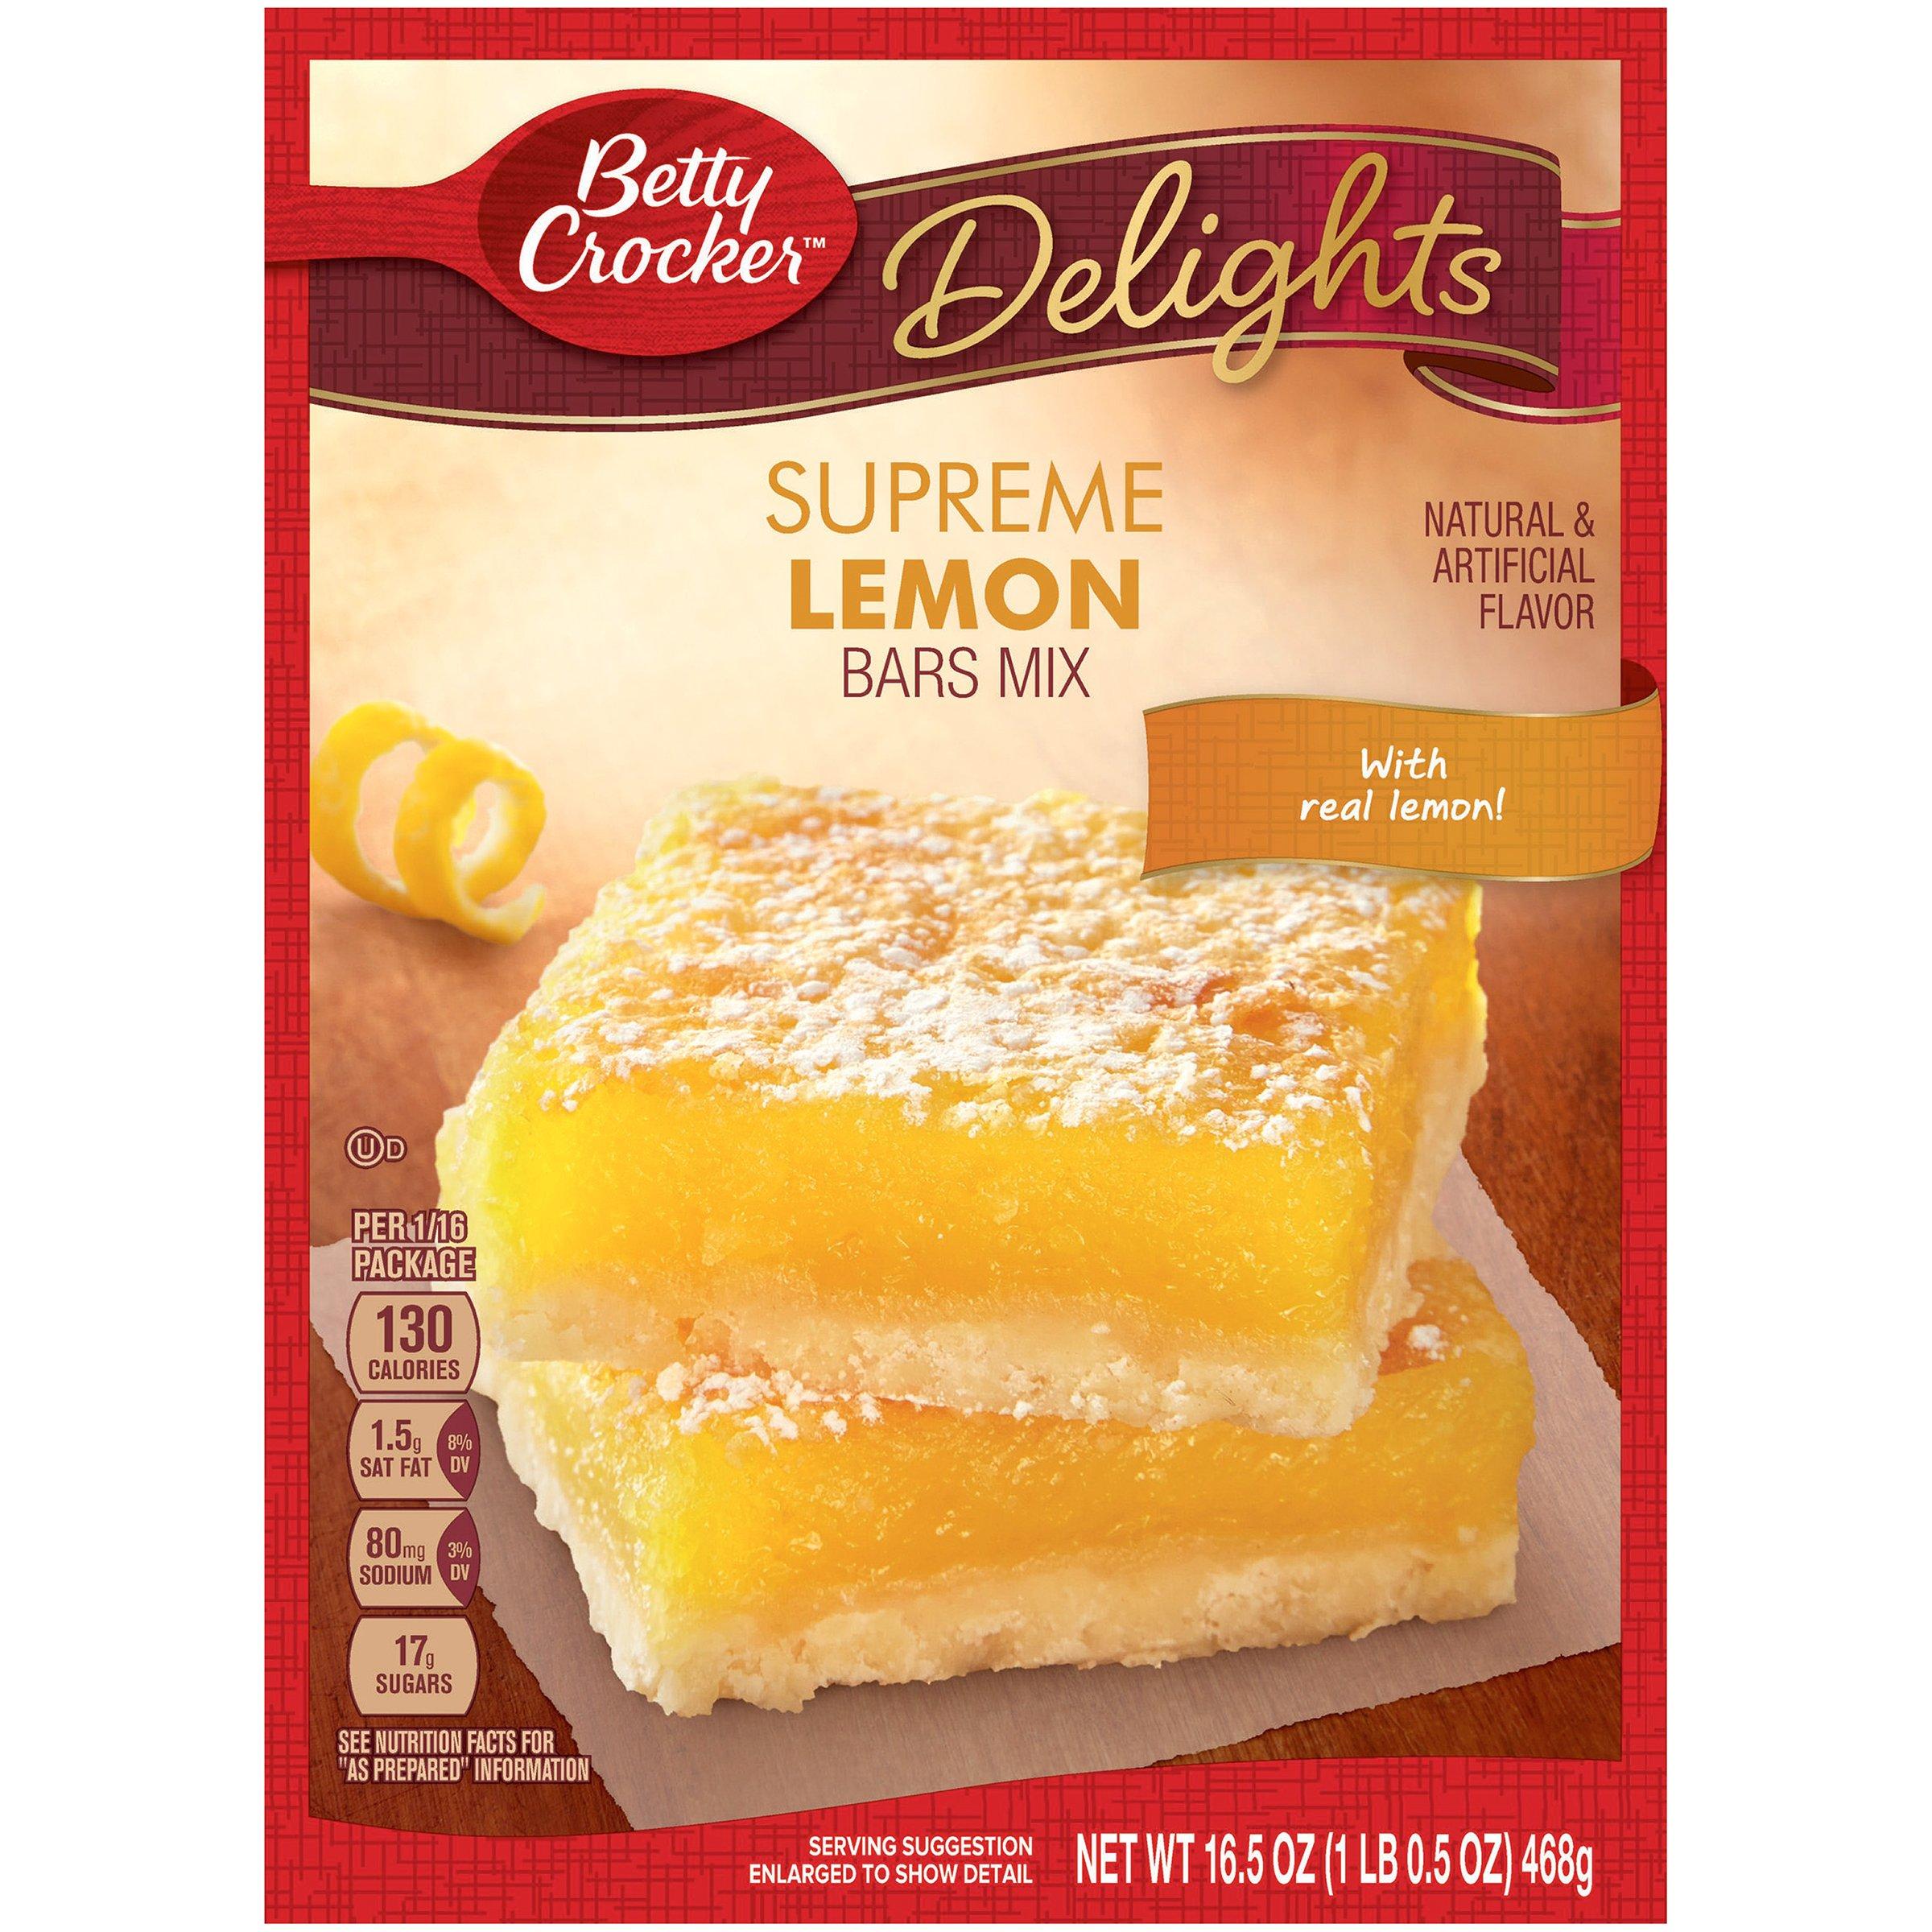 Betty Crocker Delights, Supreme Lemon Bars Baking Mix, 16.5 Oz Box (Pack of 12) by Betty Crocker